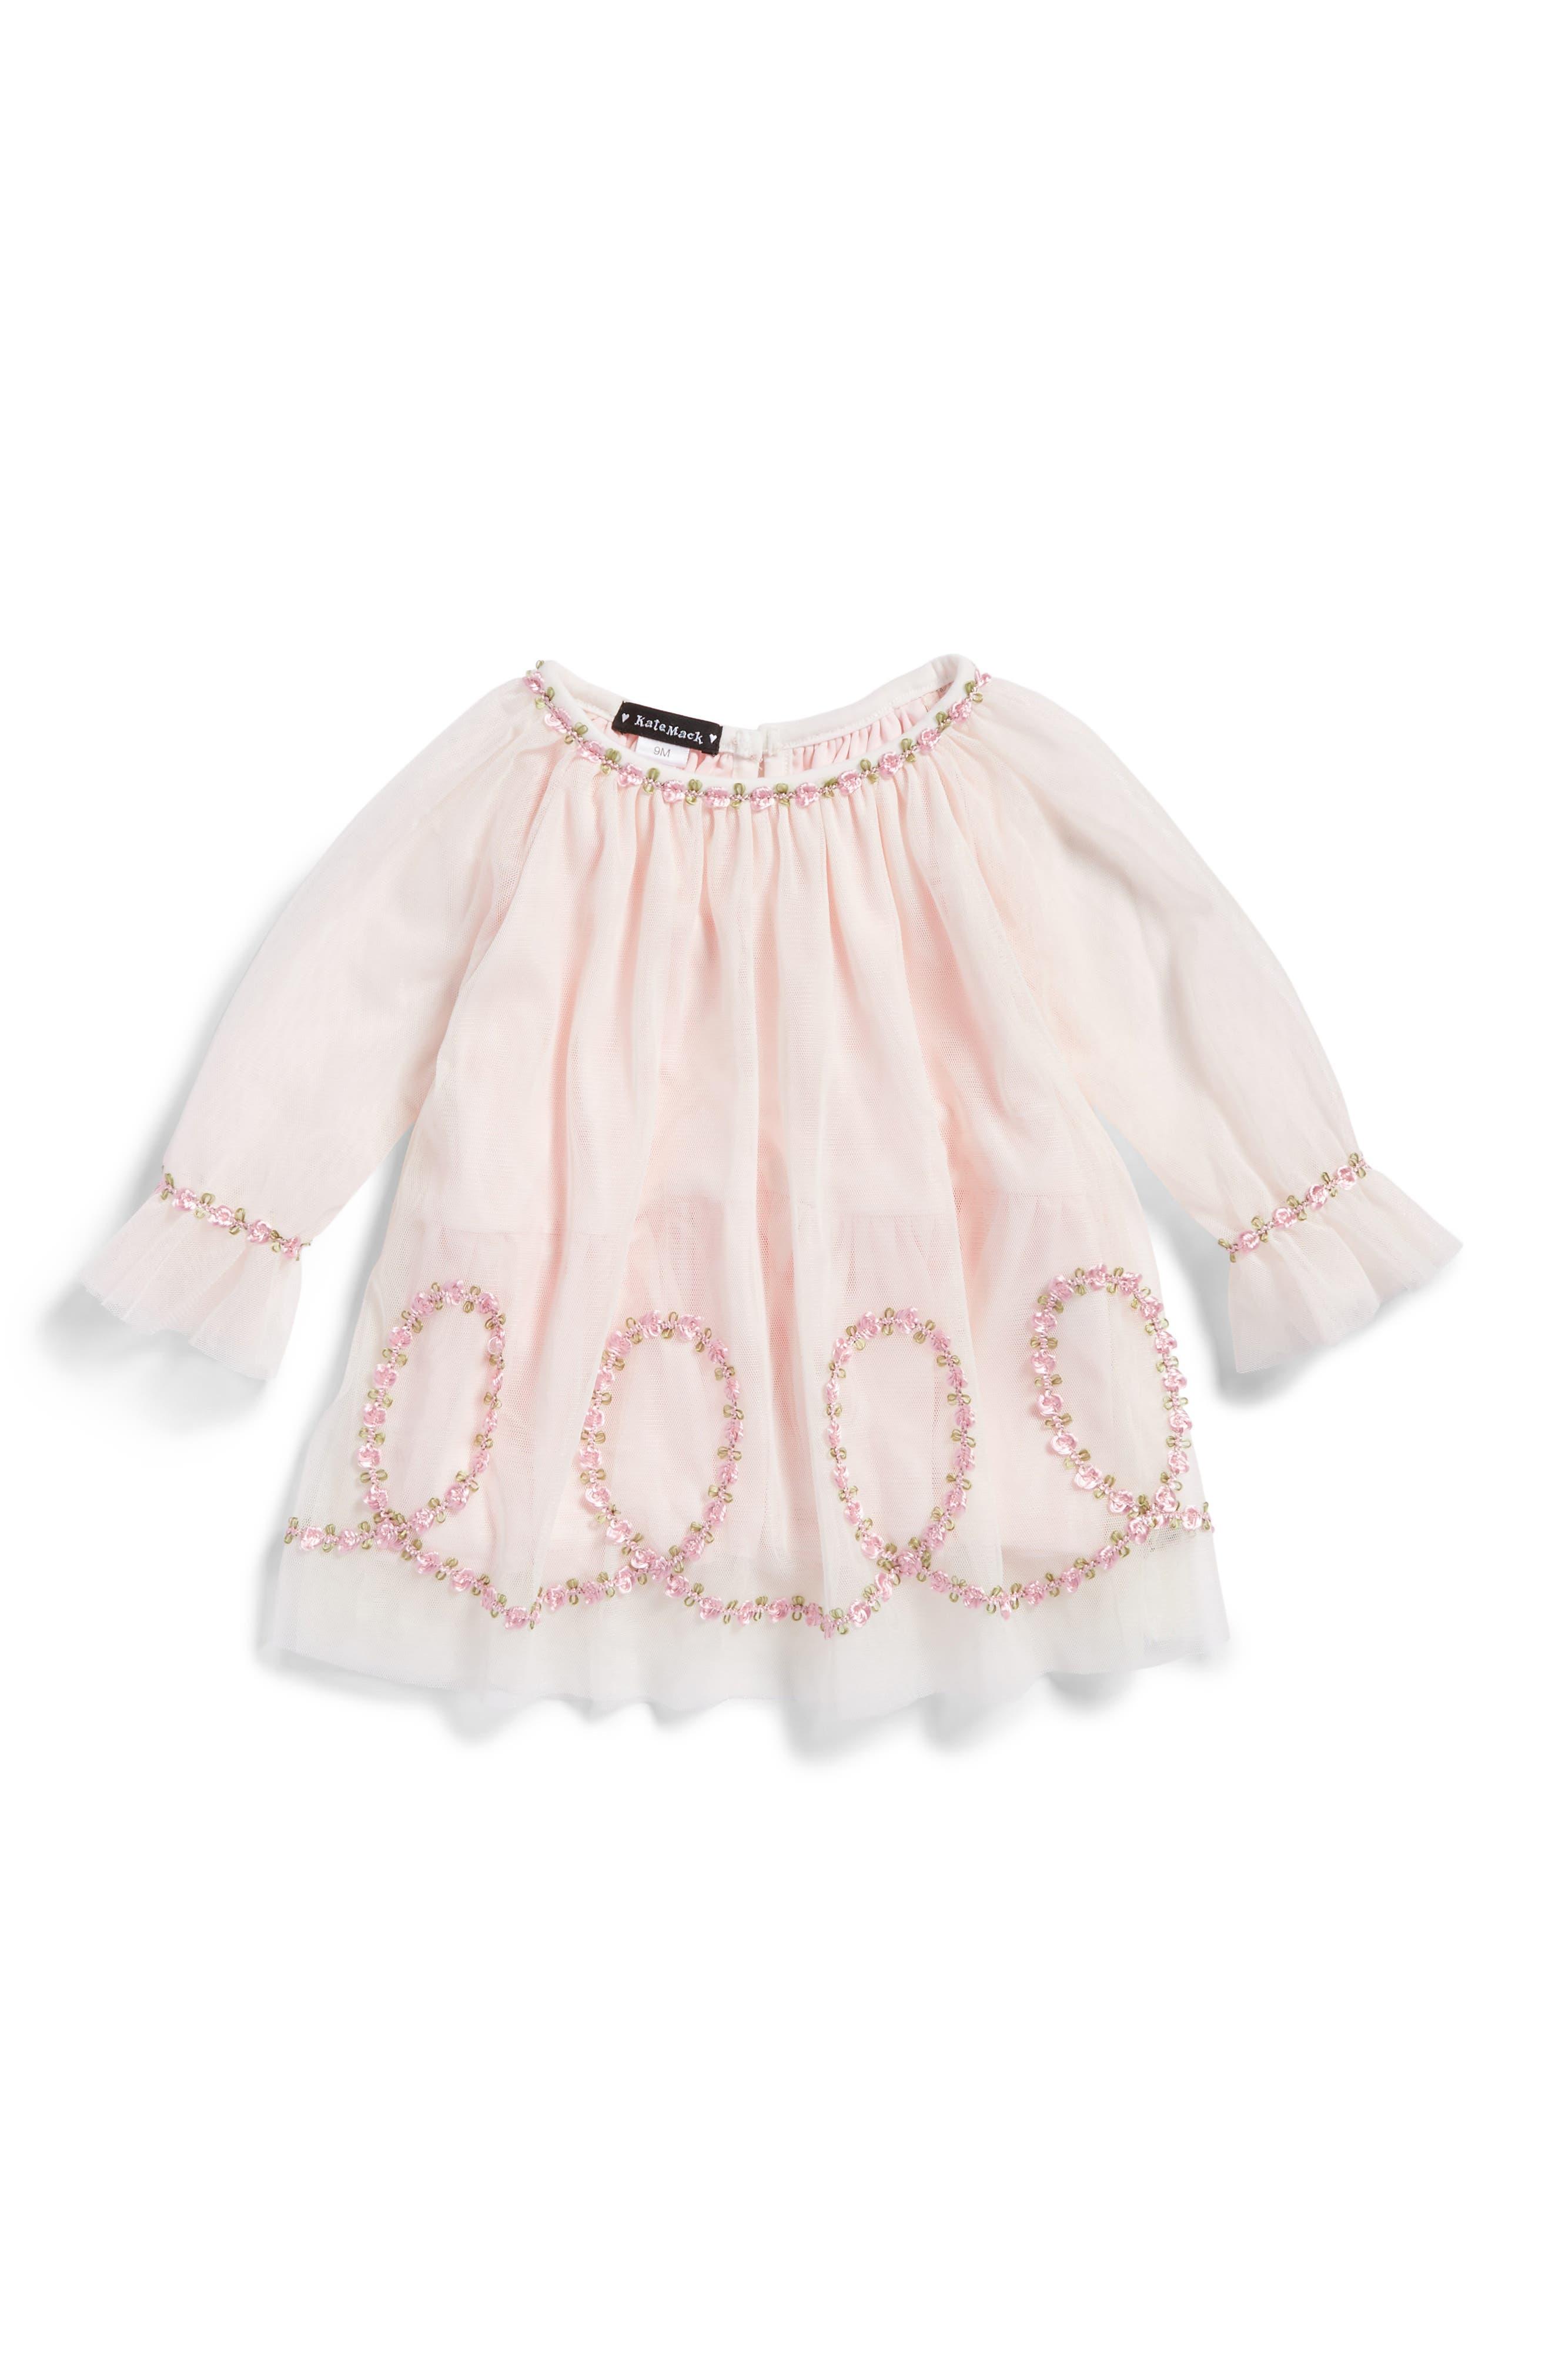 Main Image - Kate Mack Embroidered Mesh Dress (Baby Girls)